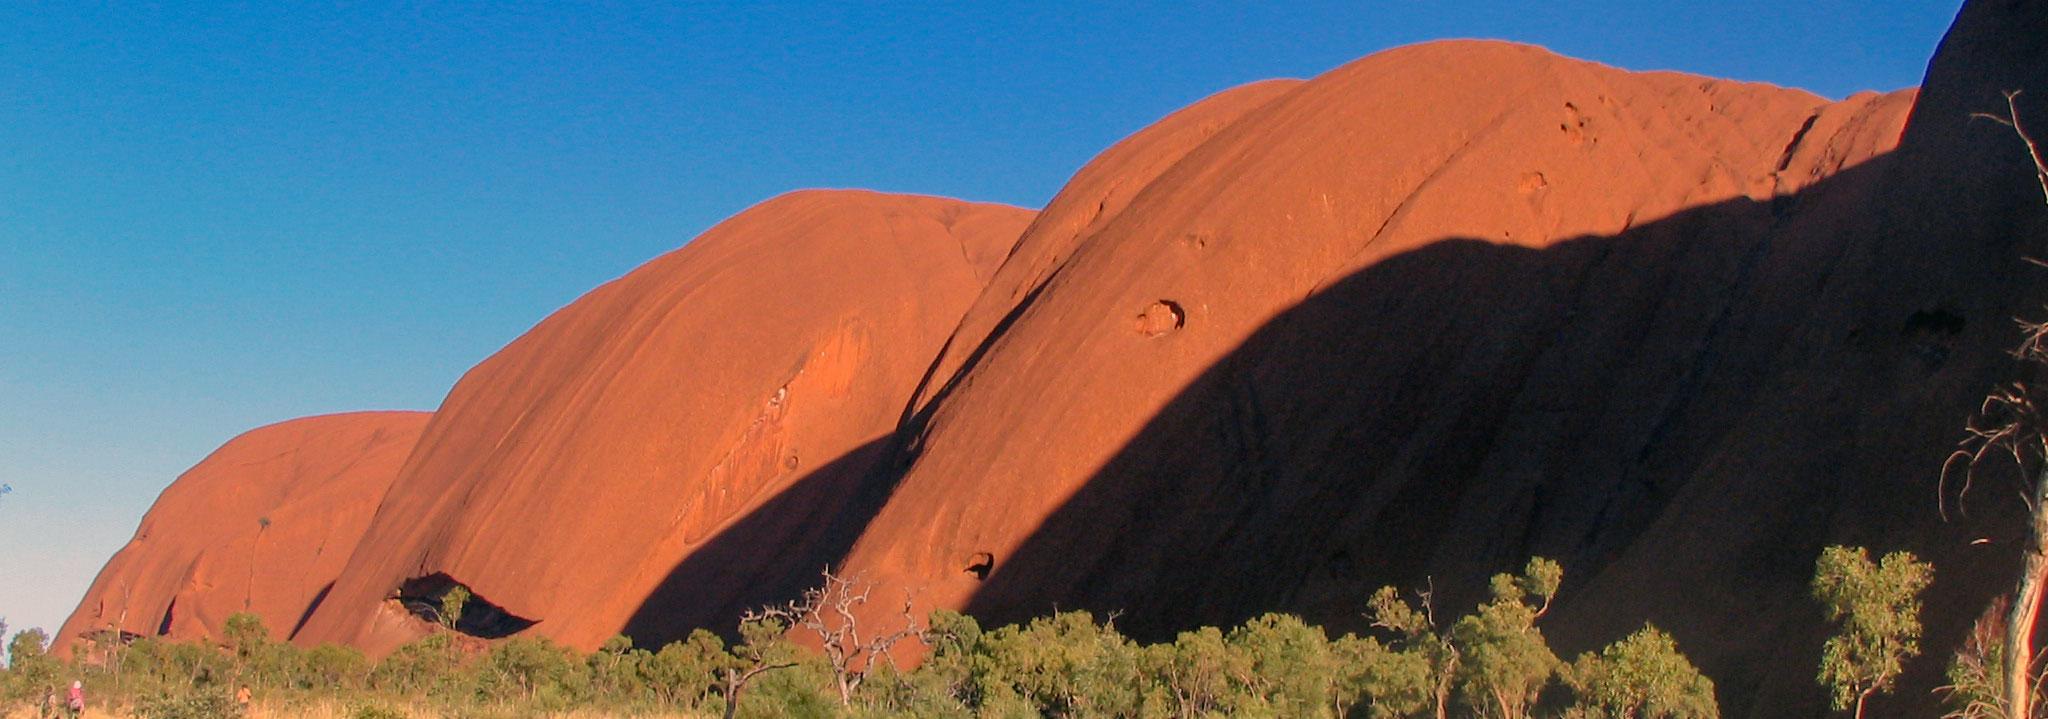 Map Of Australia Showing Uluru.Annotated Map Of Ayers Rock Uluru Northern Territory Australia